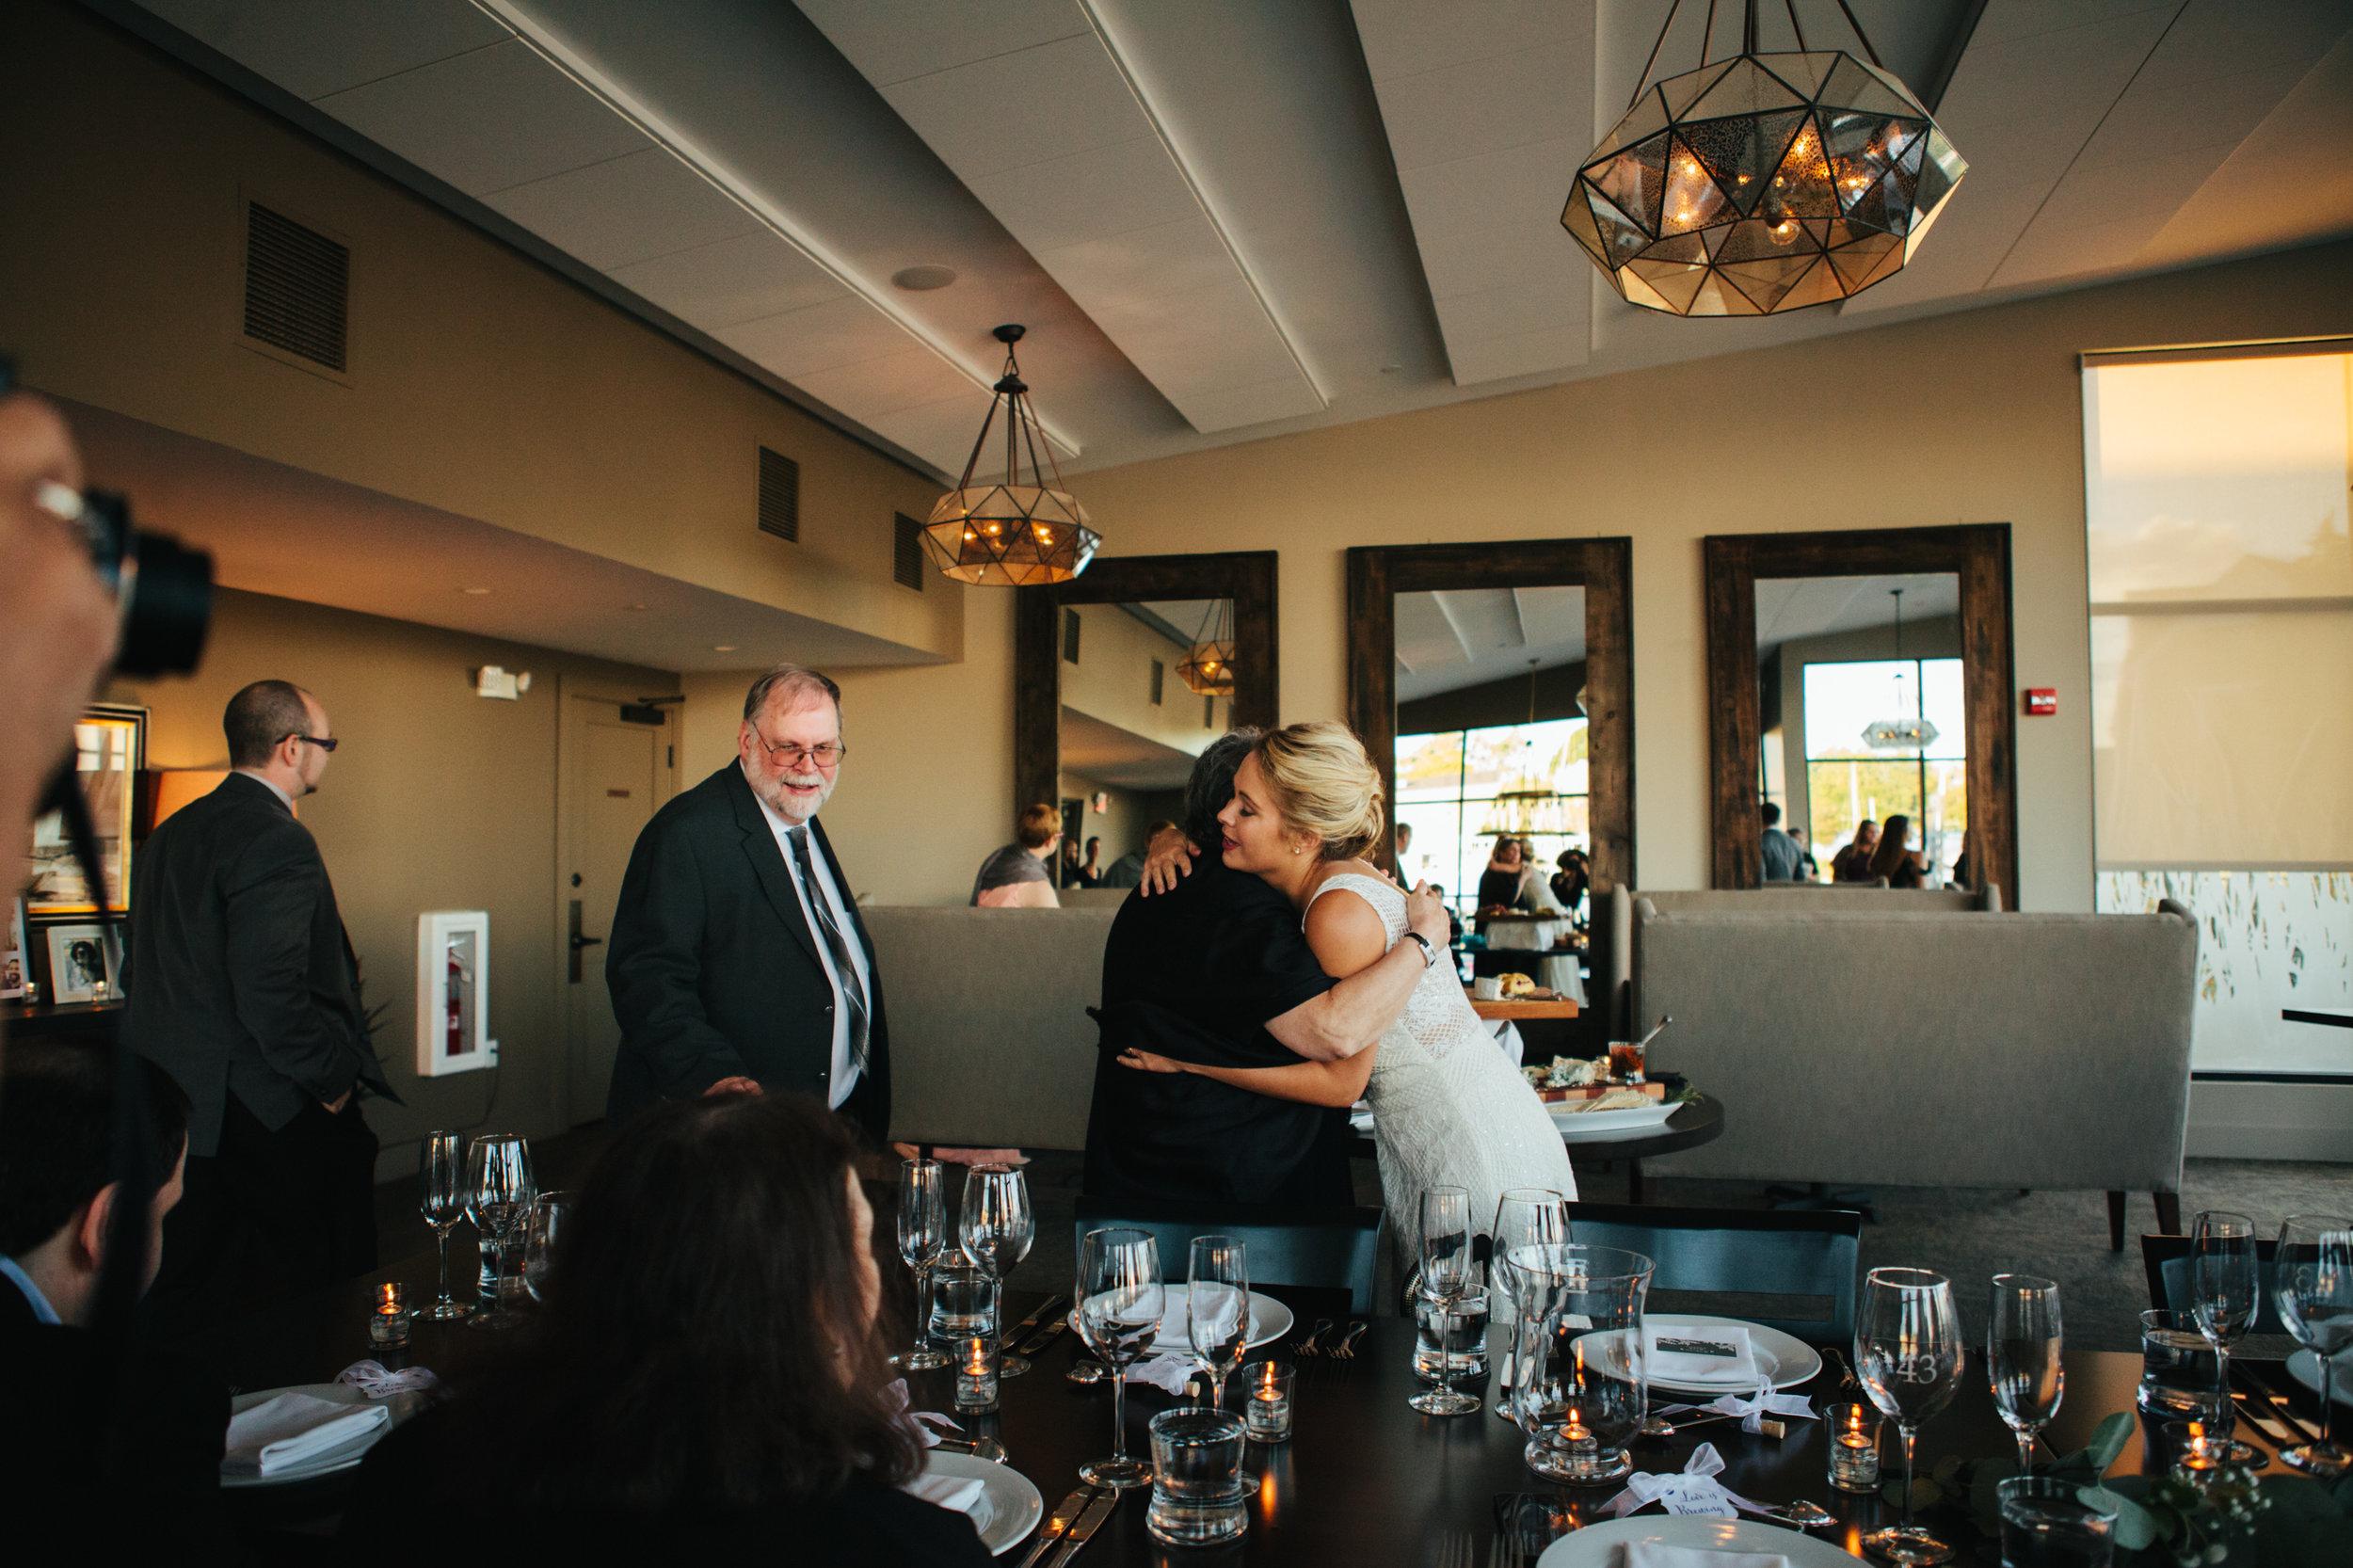 south-portland-maine-wedding-photographer-north-43-3517.jpg